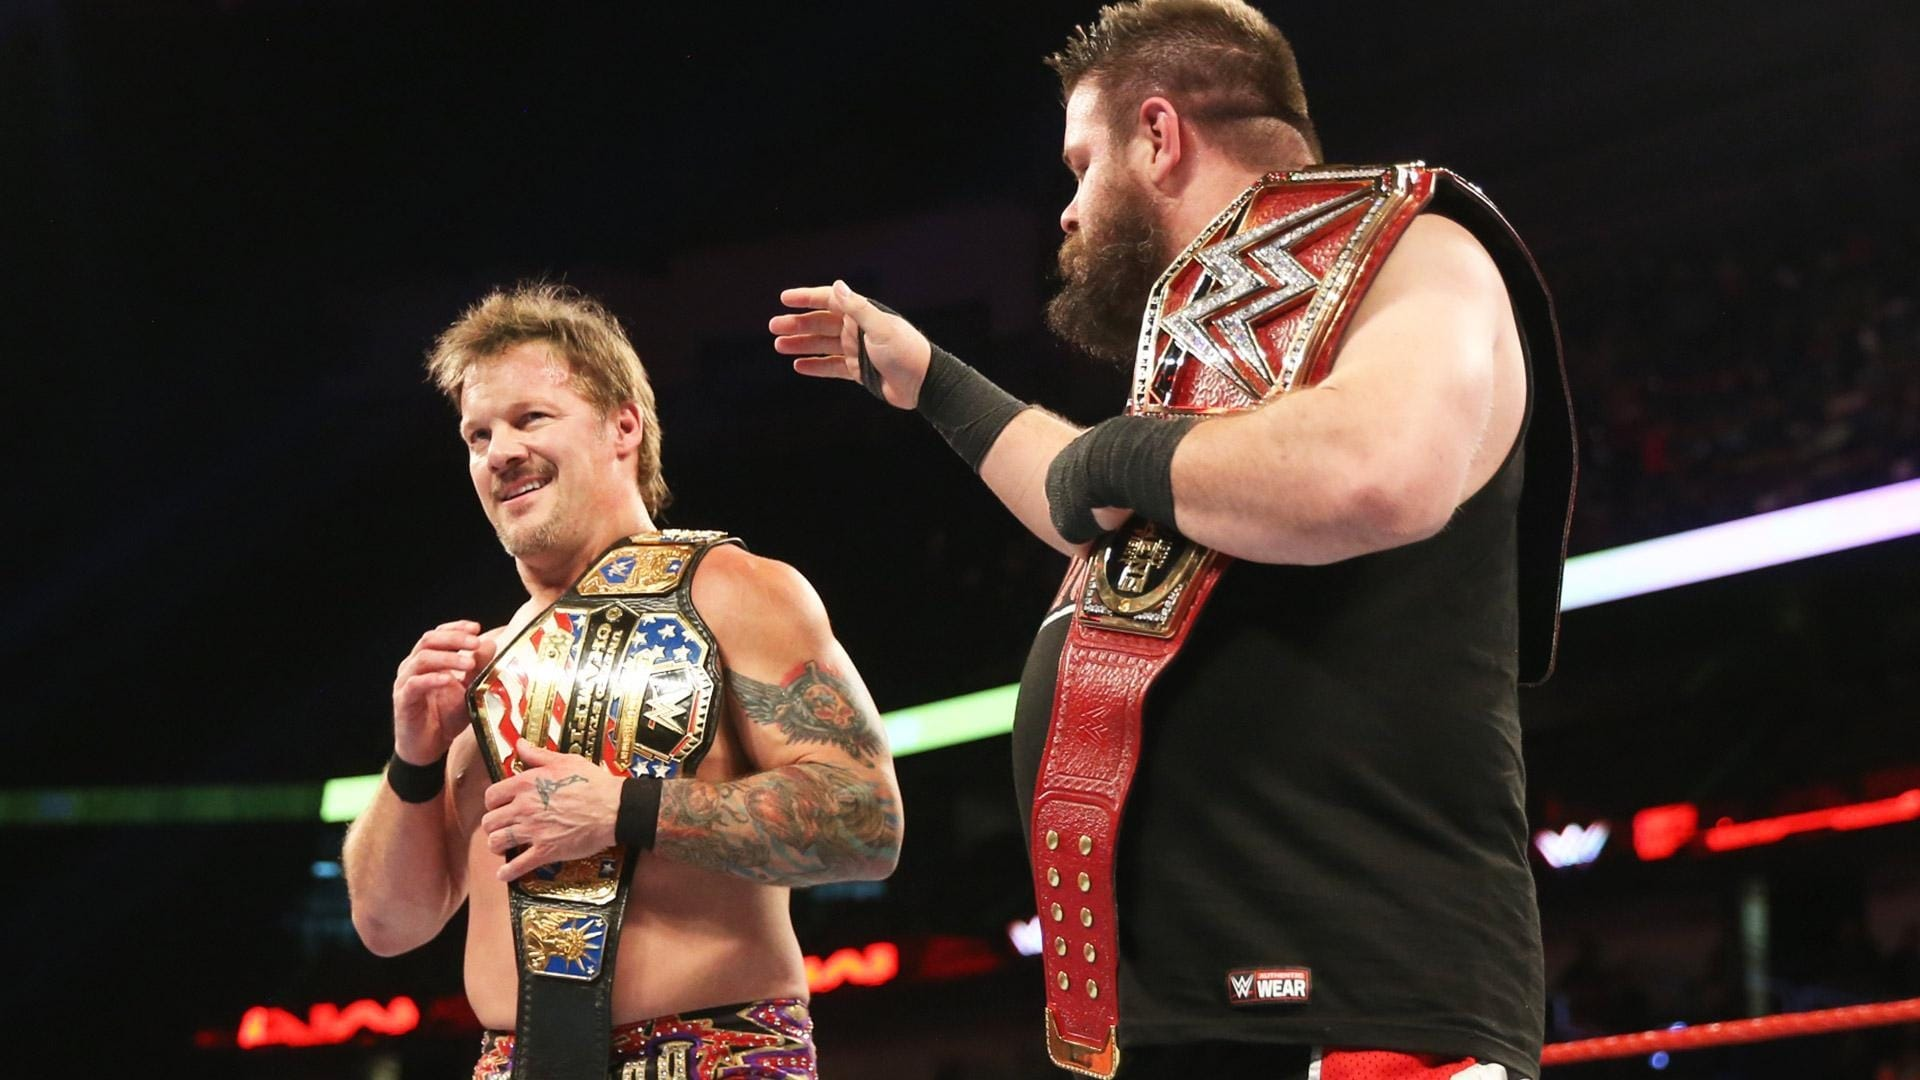 WWE Raw Season 25 :Episode 2  January 9, 2017 (New Orleans, Louisiana)